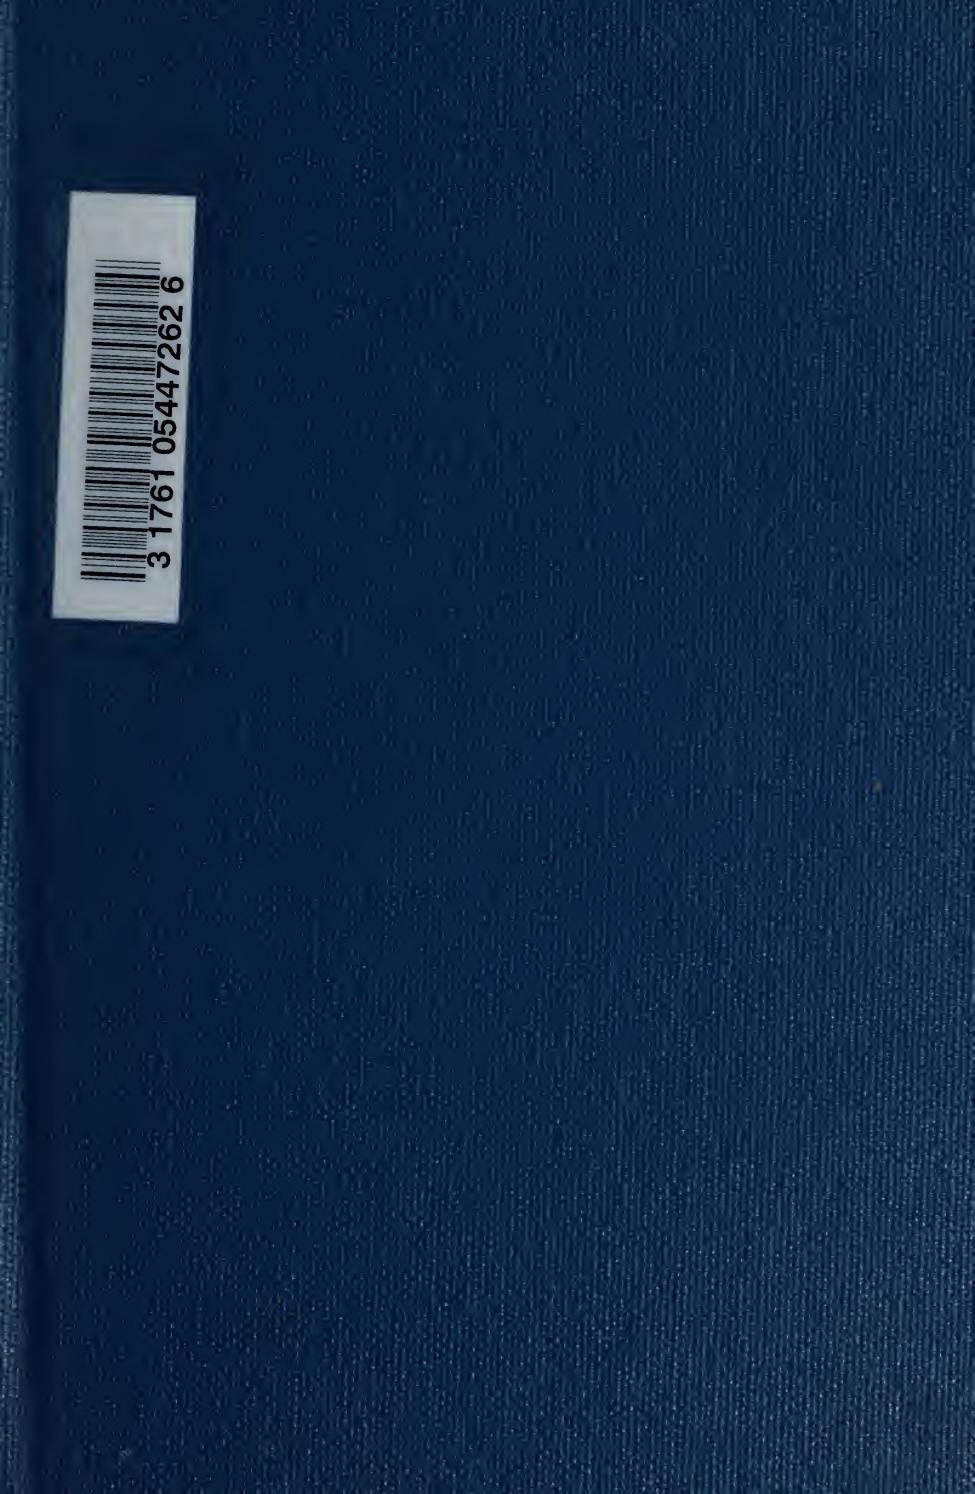 Dictionaryofgerm00Cuttuoft By Samo Marina - Issuu